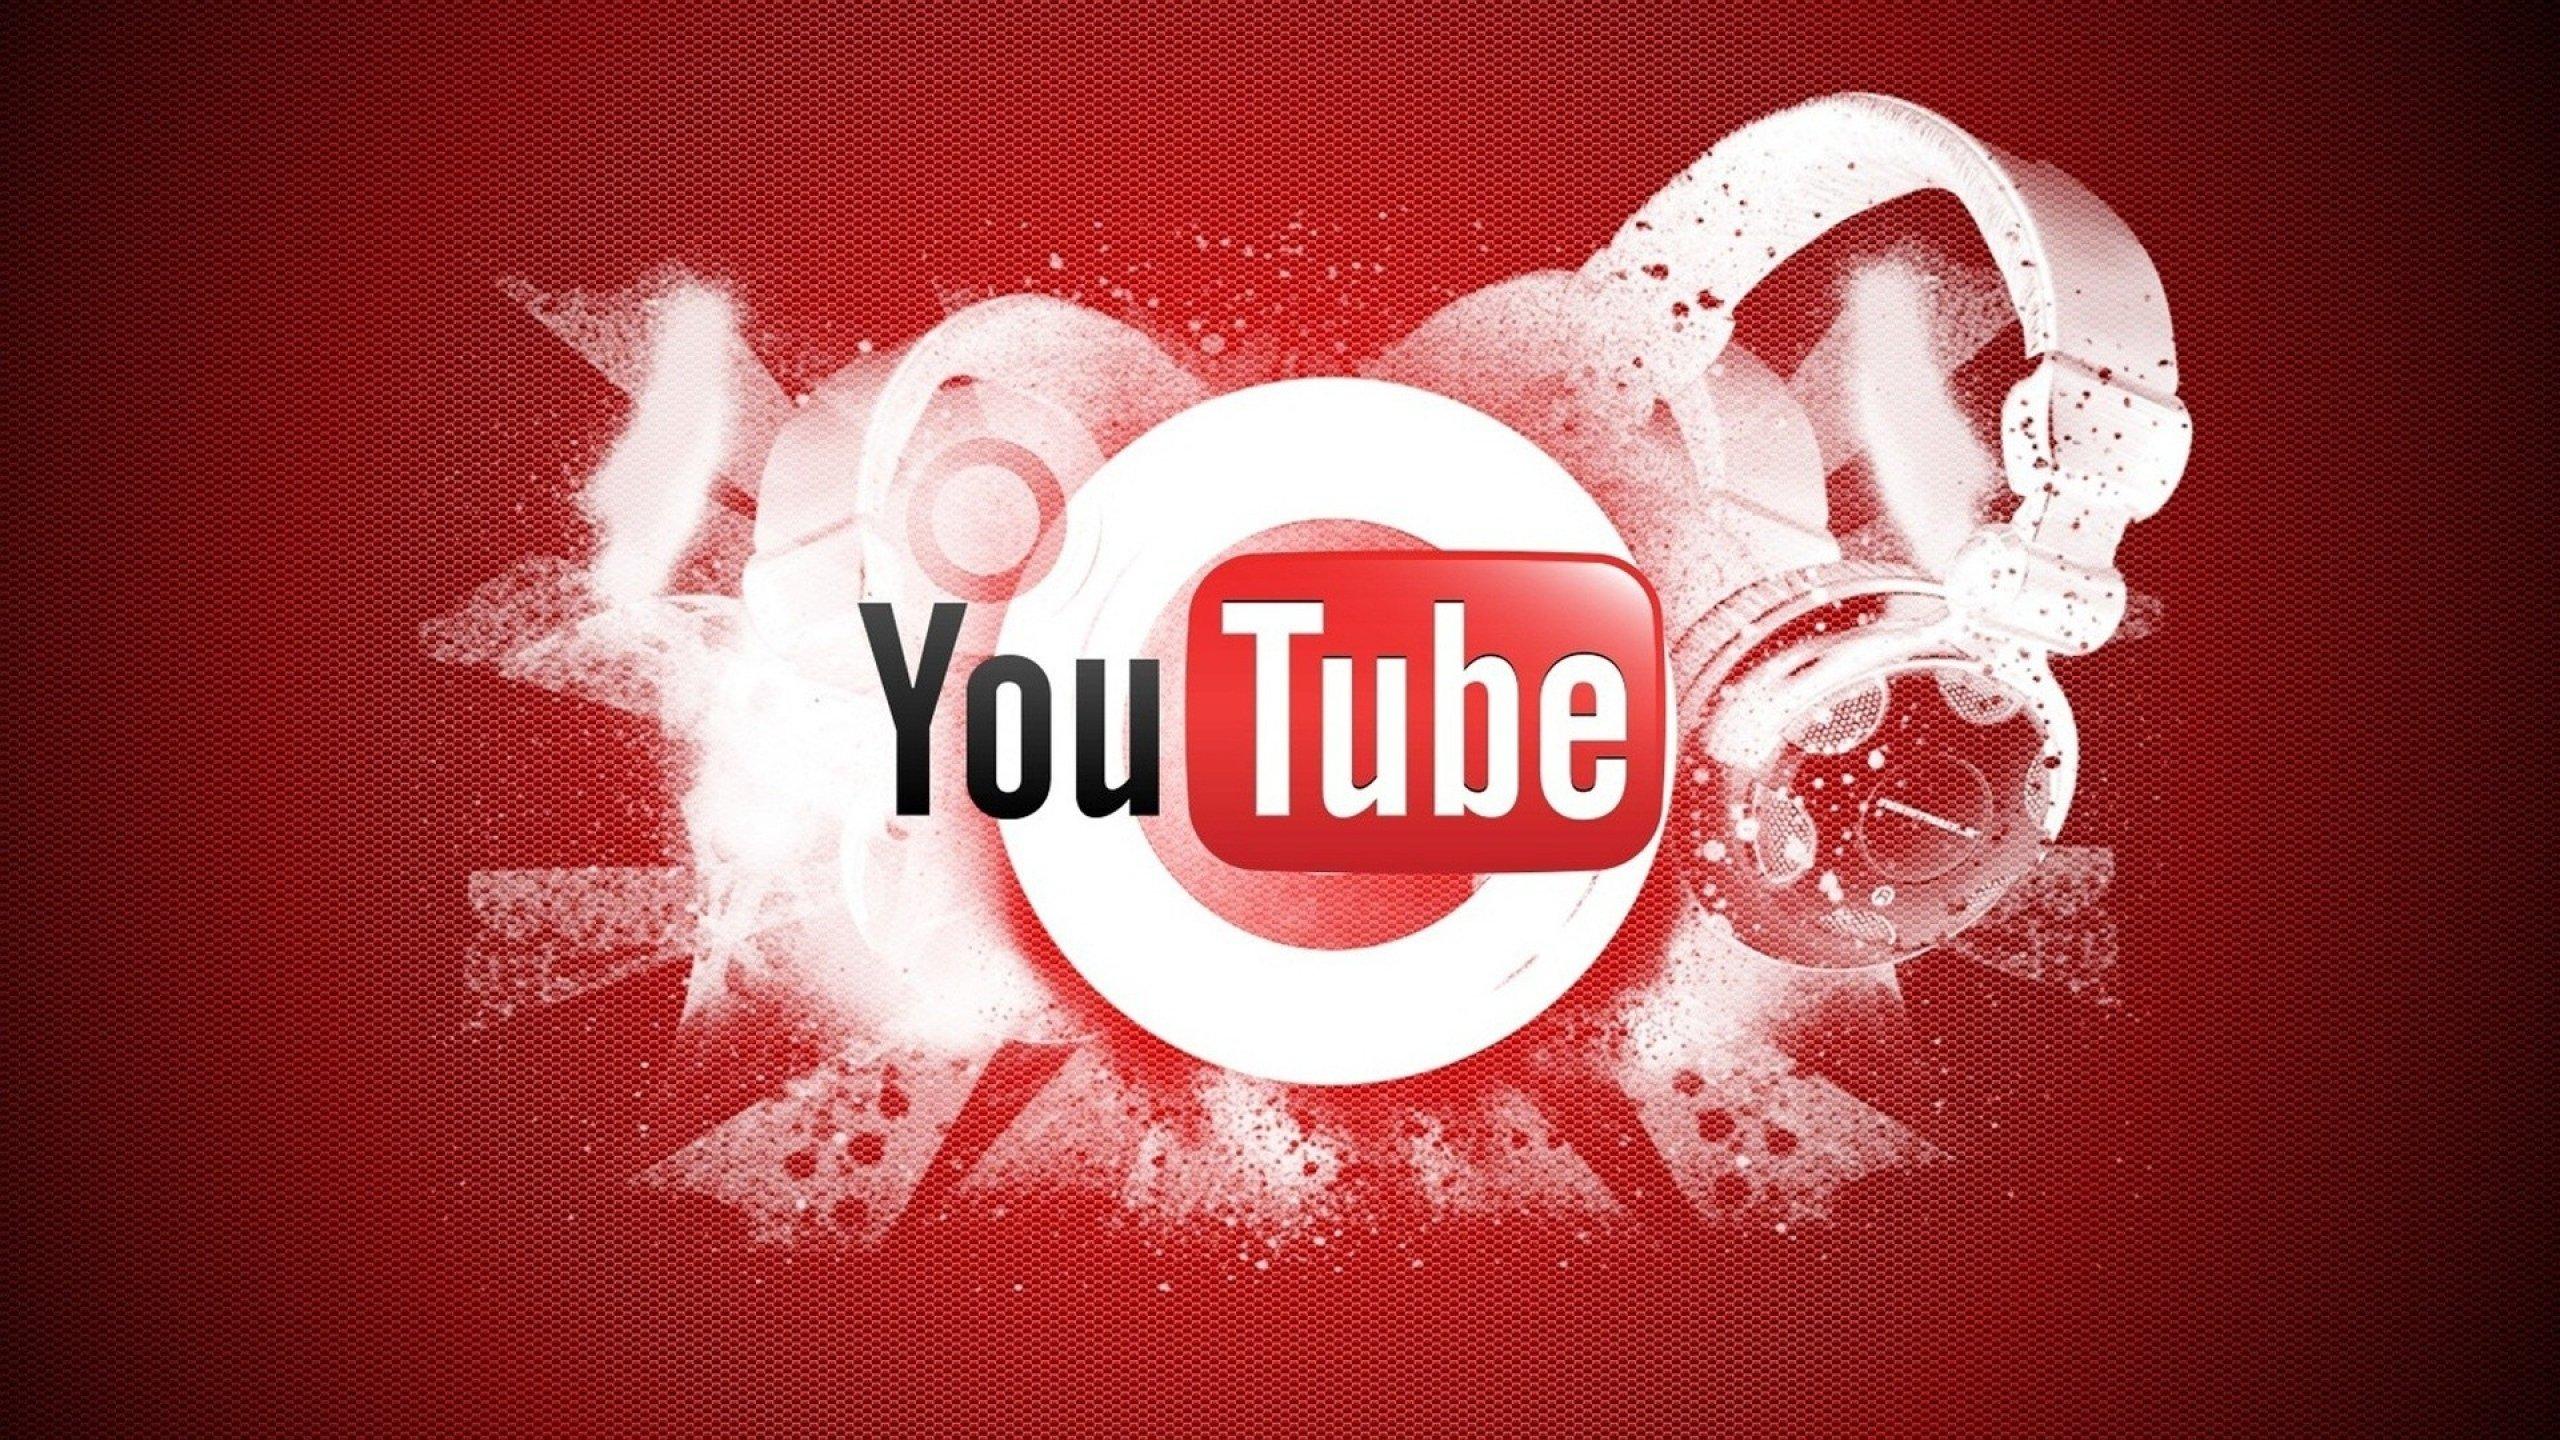 2560x1440 Wallpaper youtube video hosting logo google 2560x1440